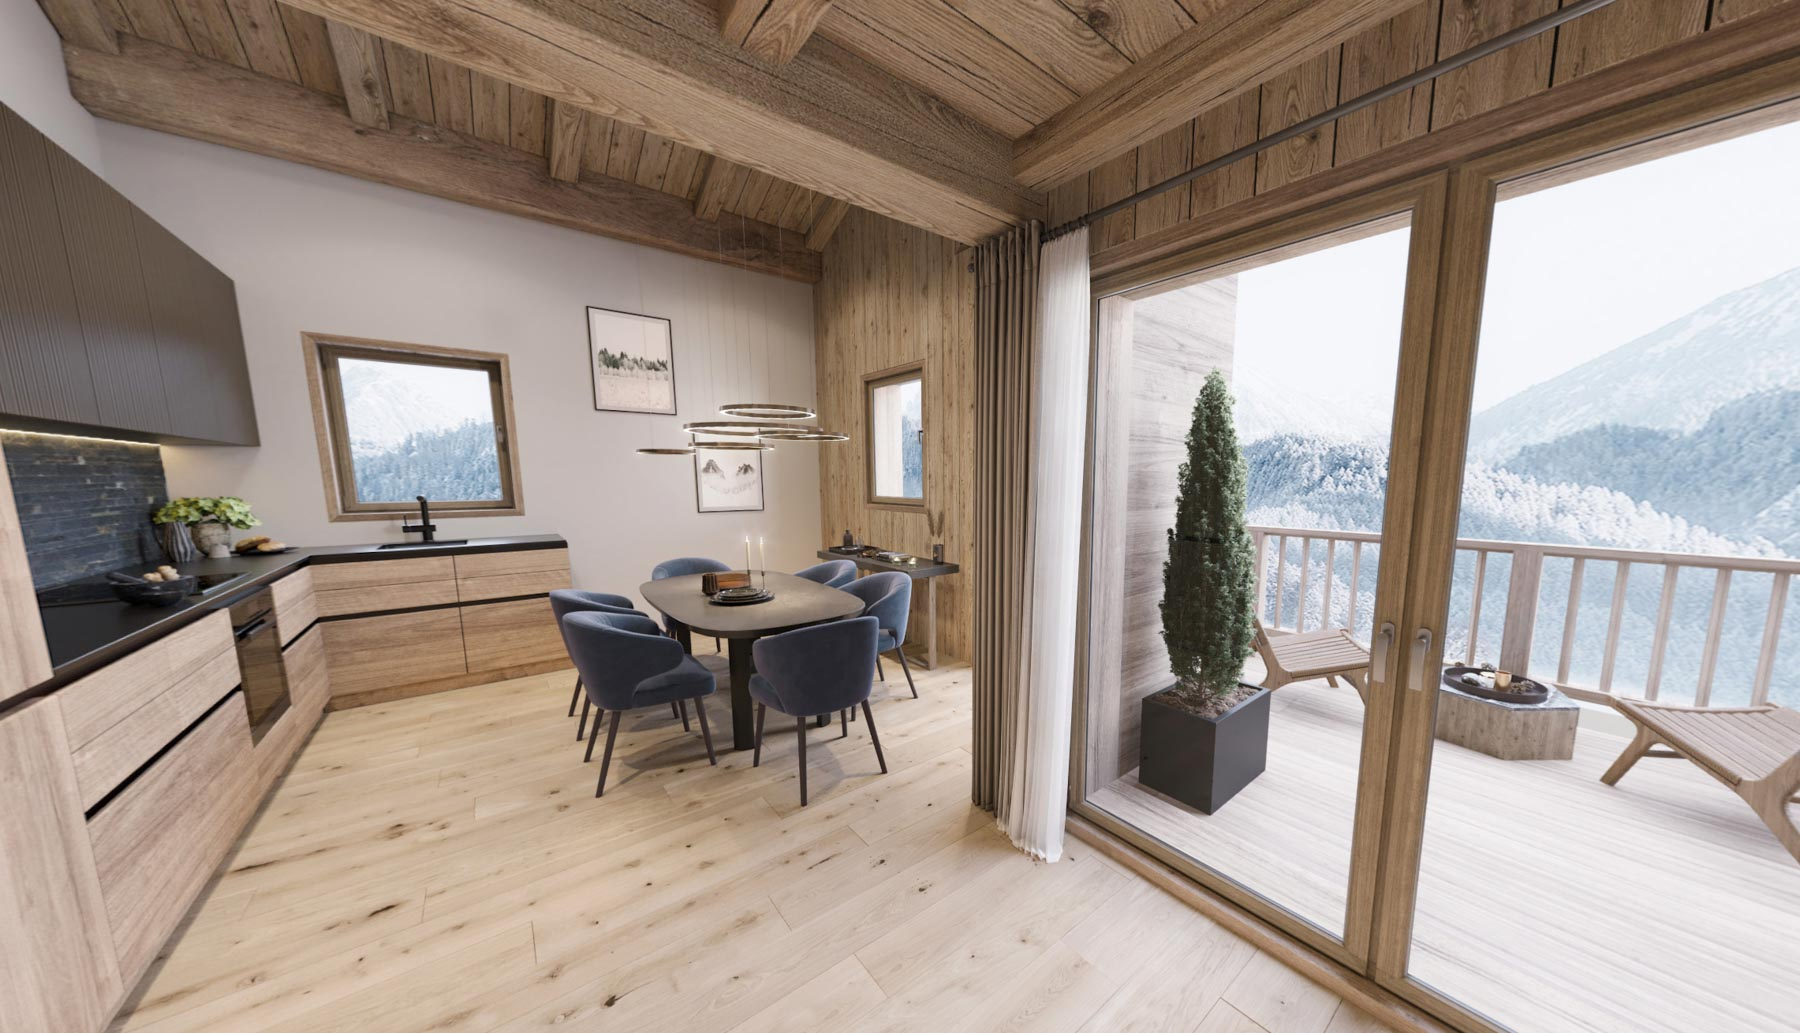 Gite Blanc Example Dining Room